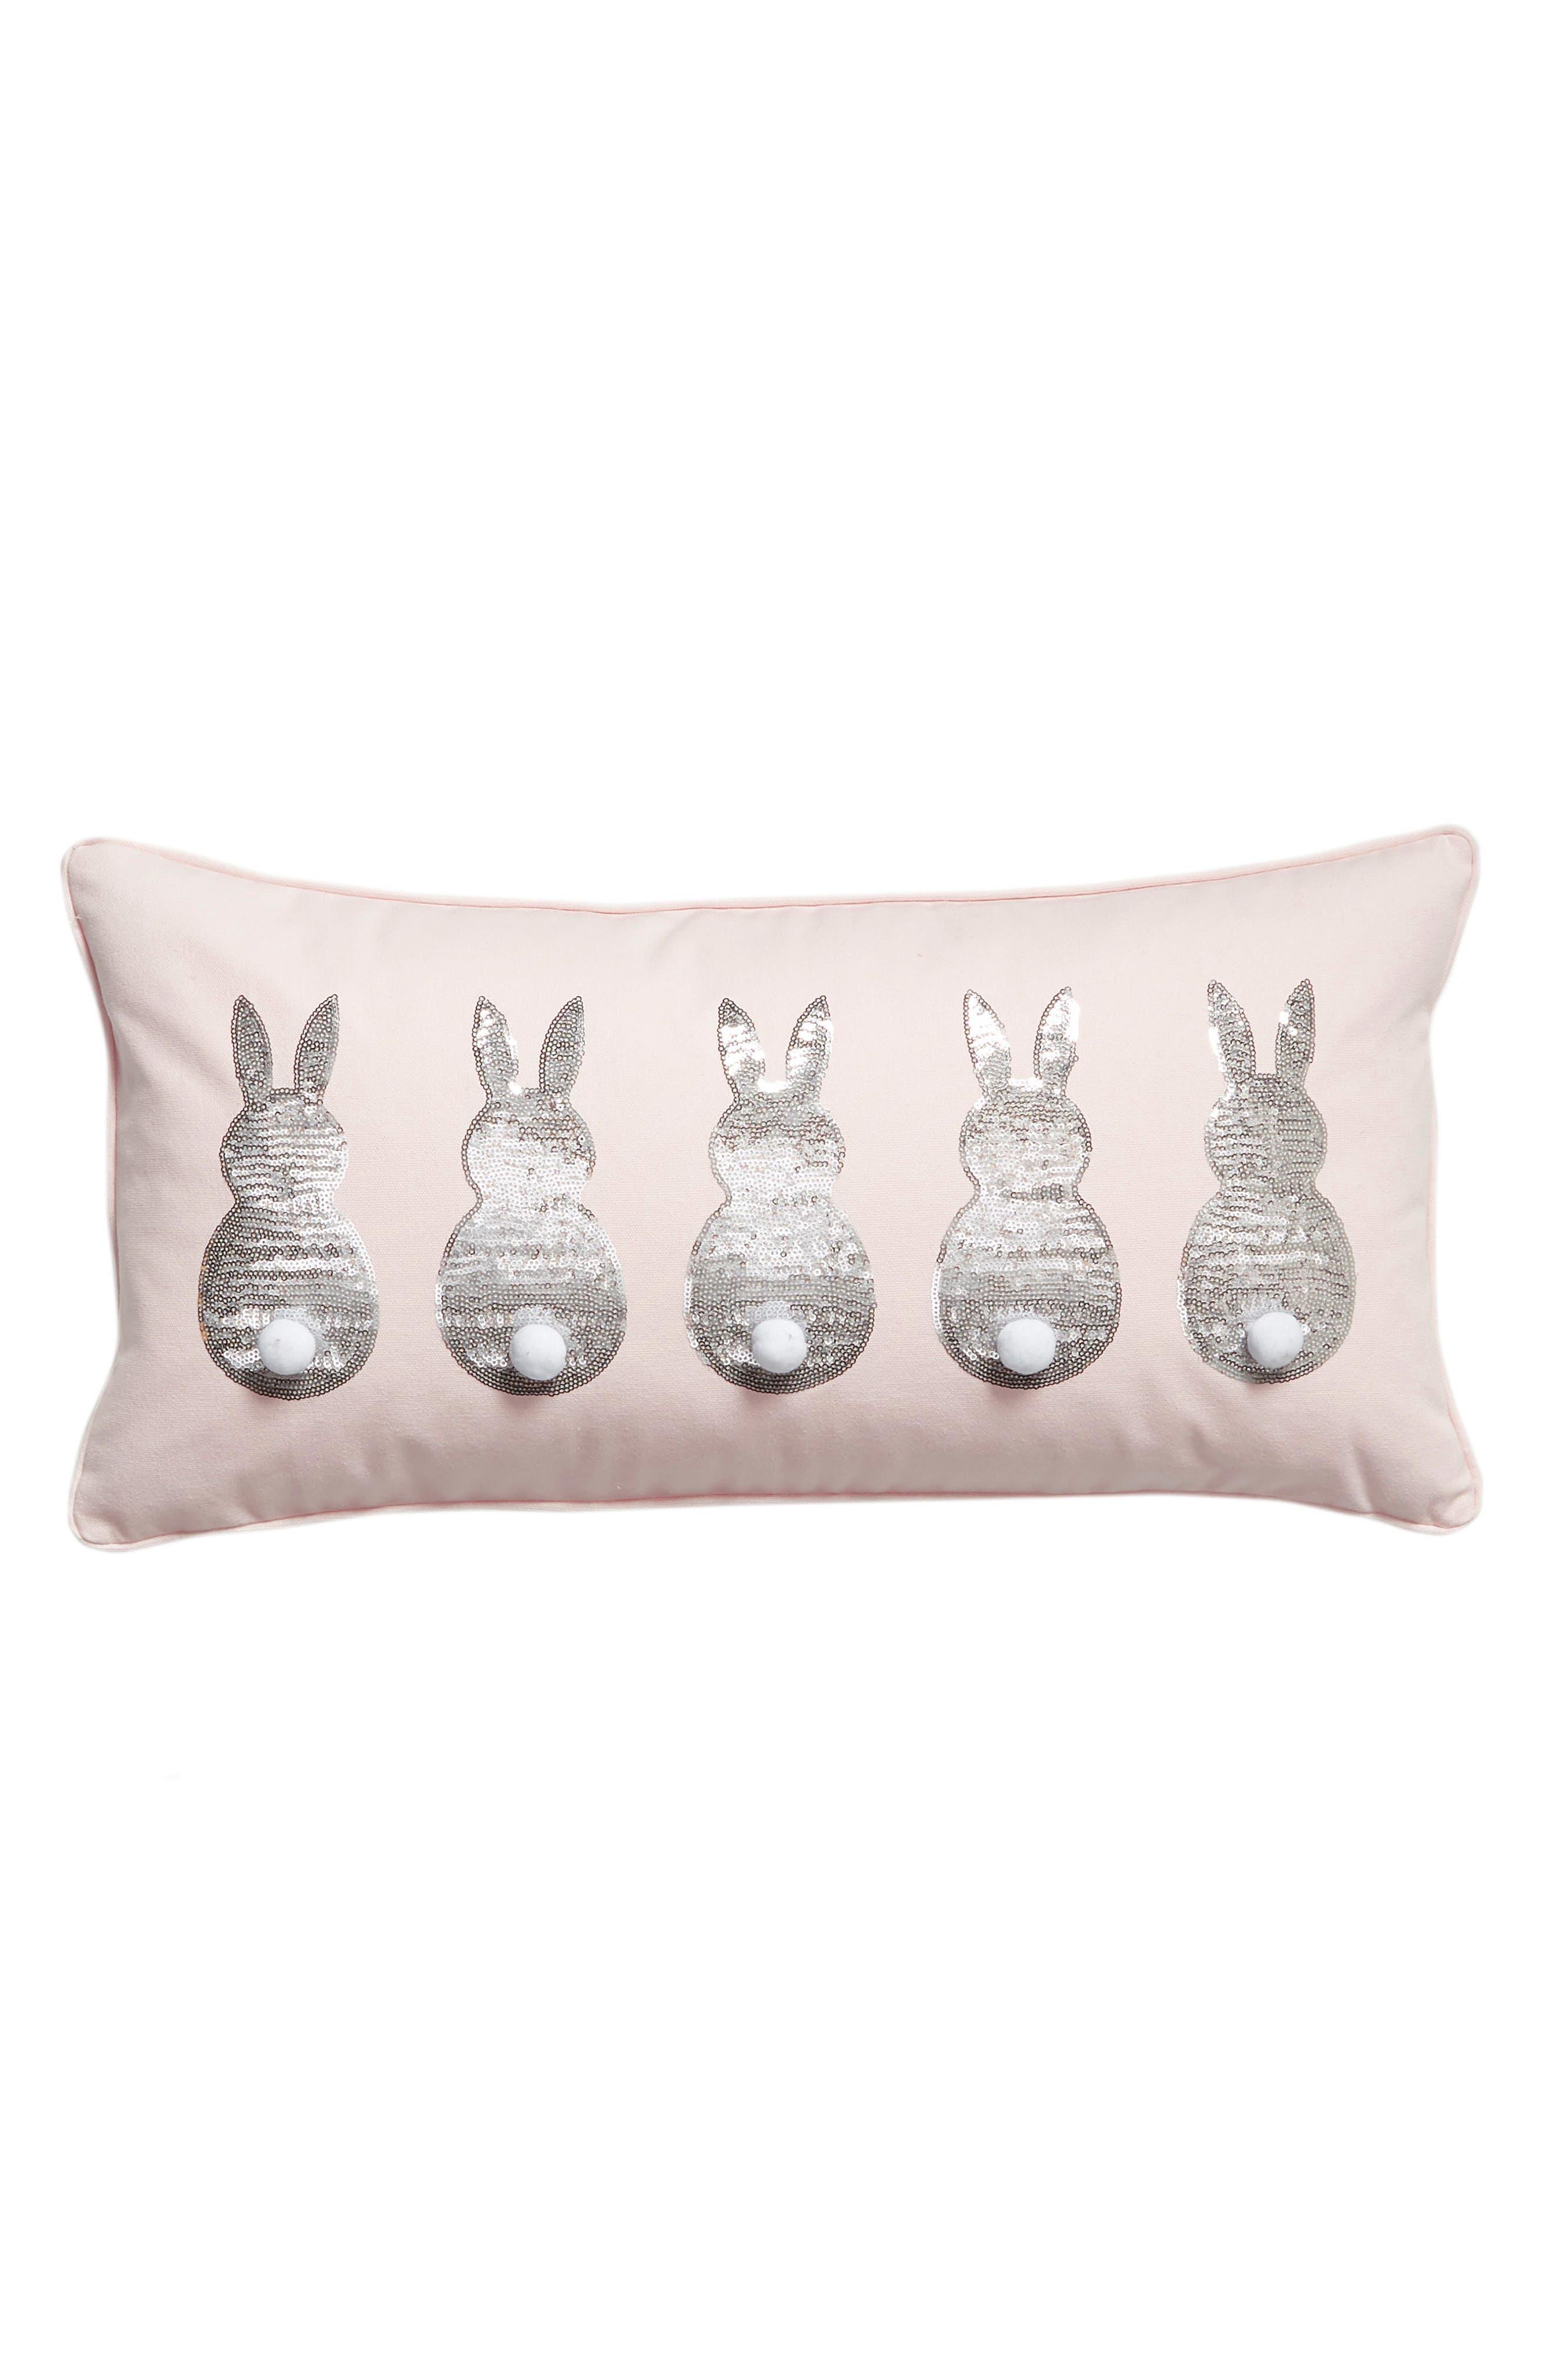 LEVTEX Sequin Bunnies Accent Pillow, Main, color, 650